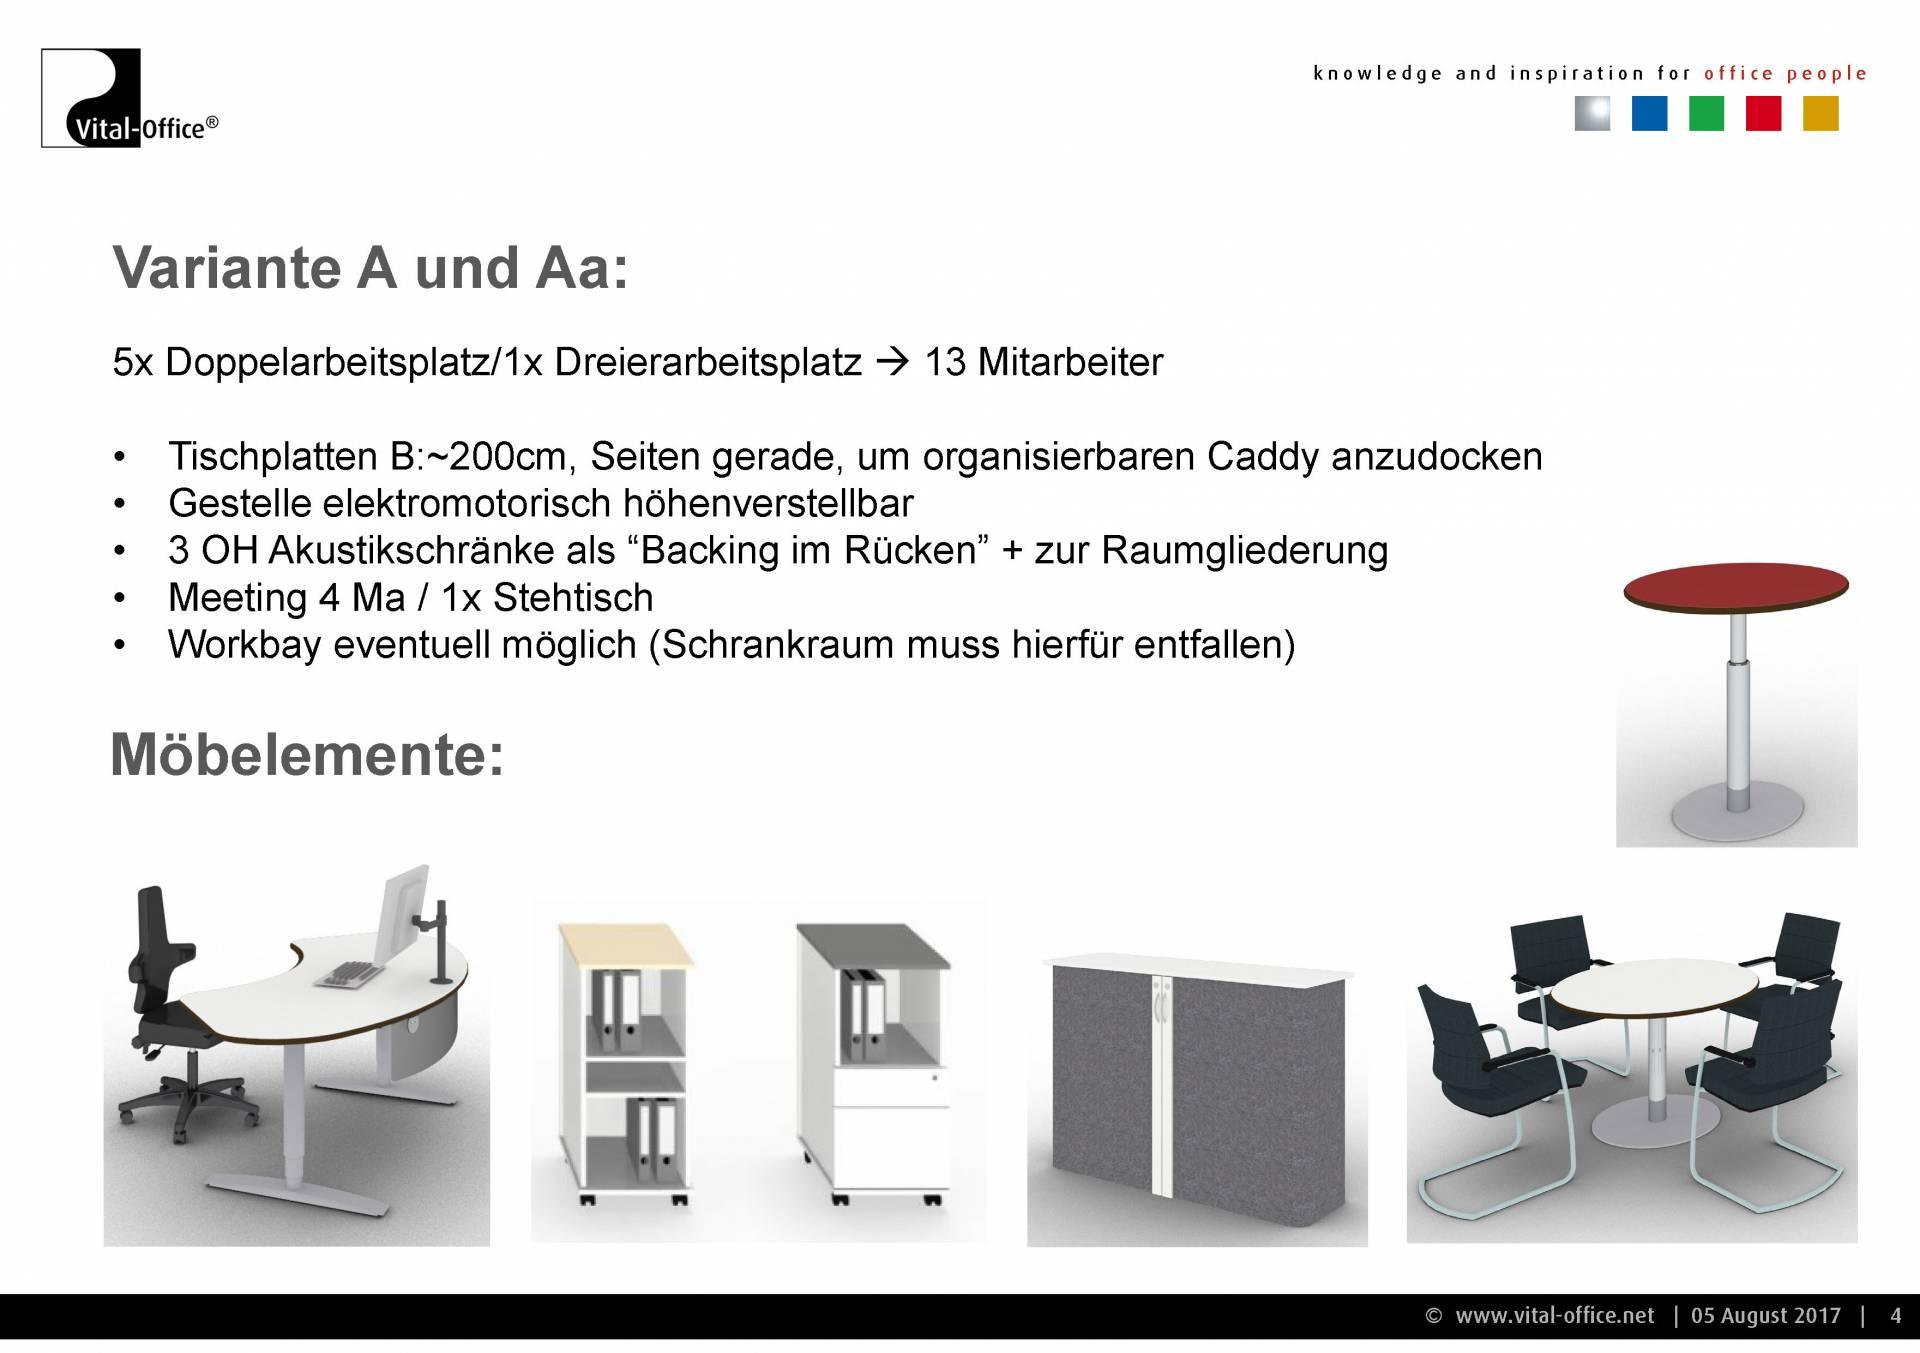 b roplanung gro raum gruppenb ro dtm 01 f r dk b ro und wohndesign gmbh vital office. Black Bedroom Furniture Sets. Home Design Ideas